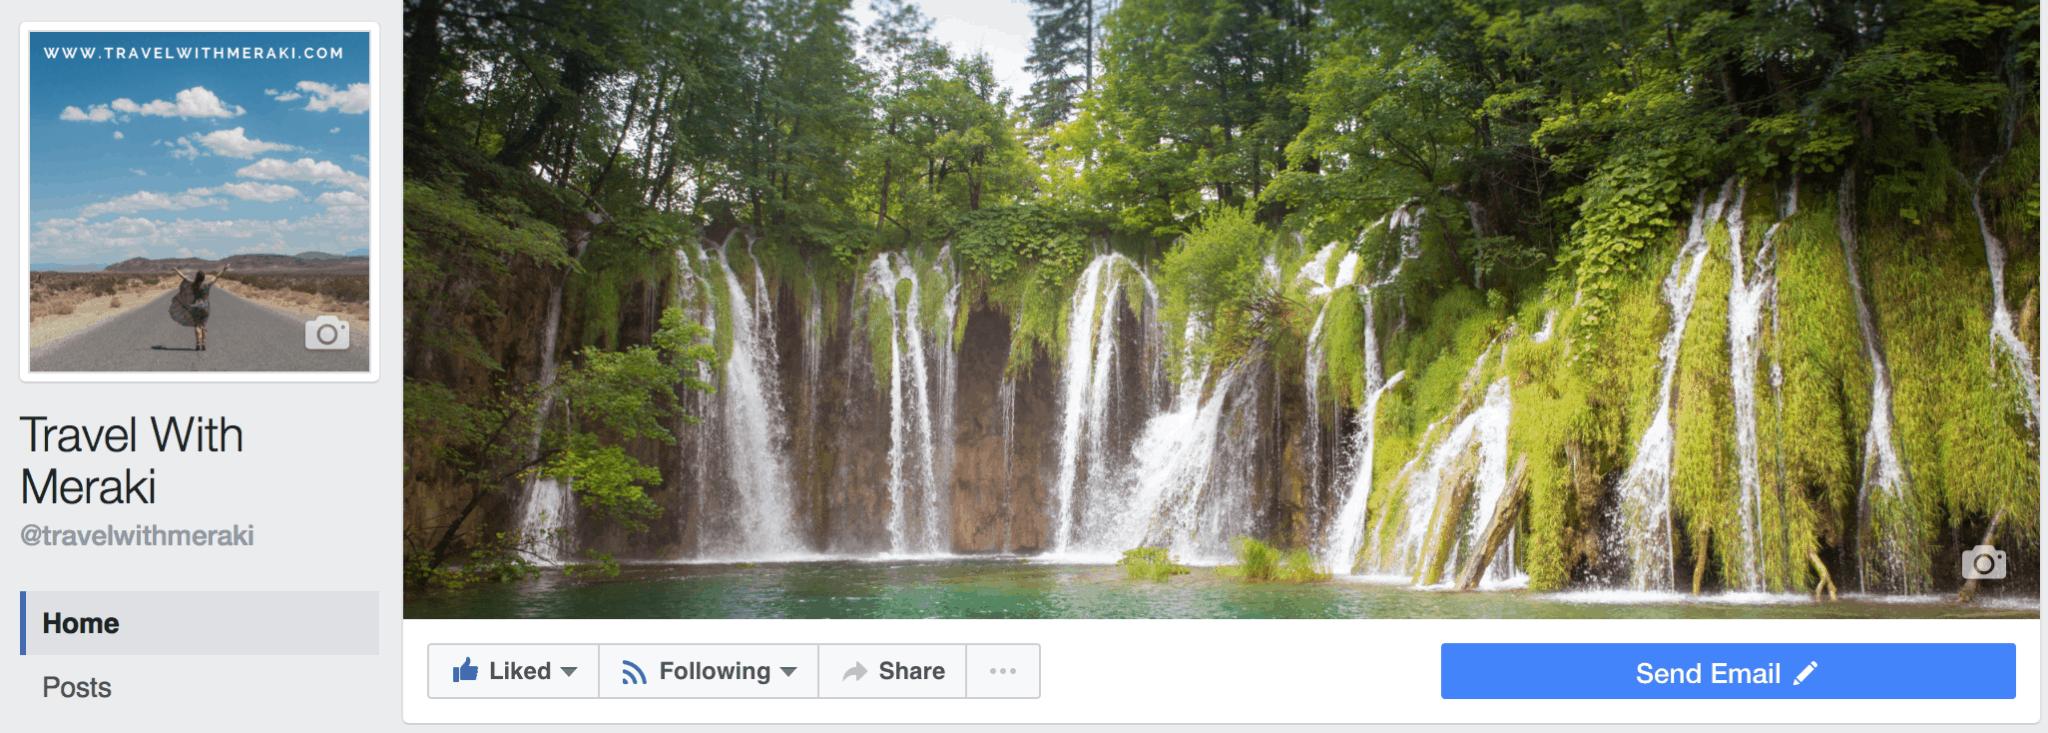 Travel with Meraki Facebook